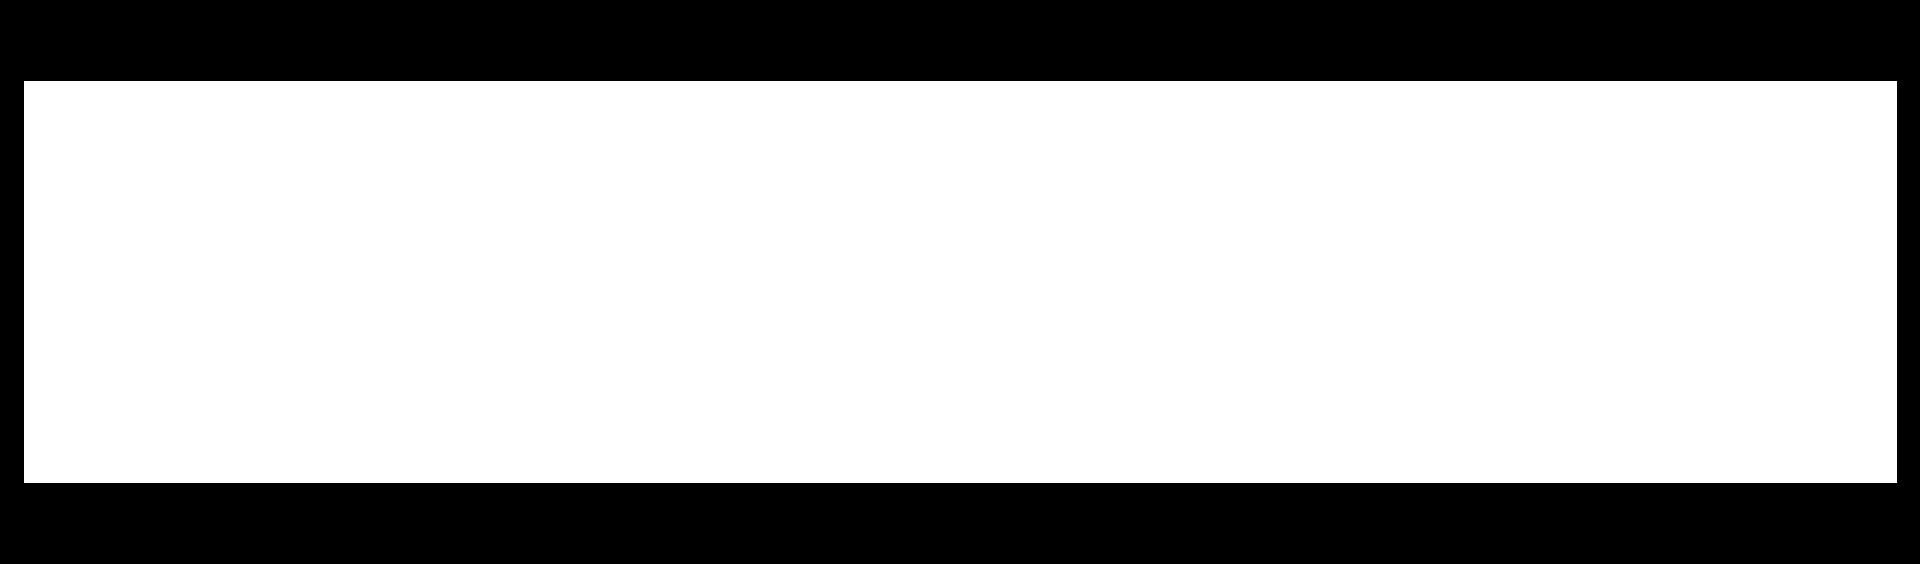 Startup OLE '22